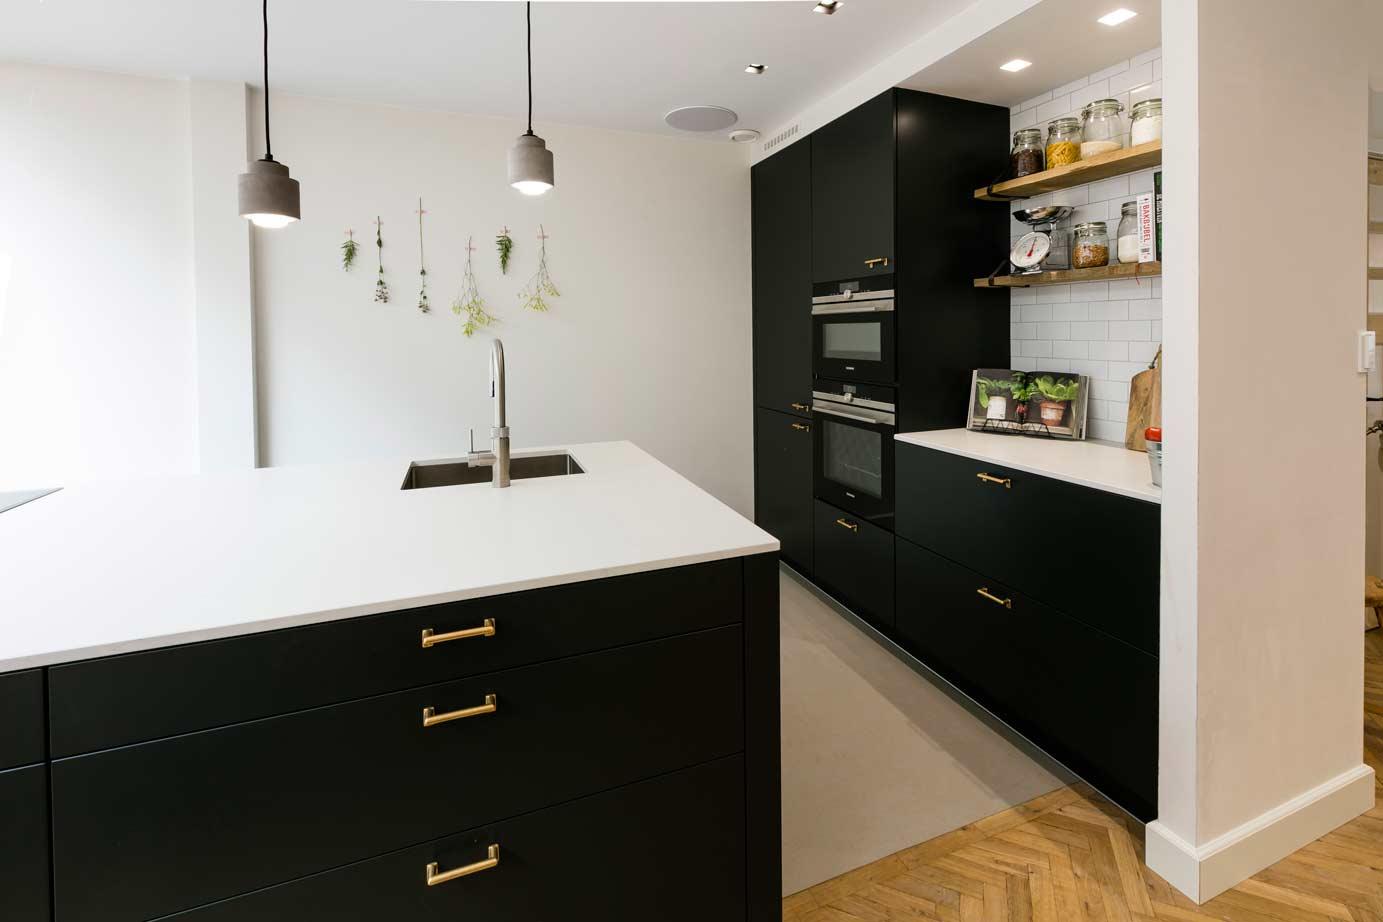 Moderne Zwarte Keuken : Zwarte moderne keuken kopen lees klantervaring uit heemstede keur